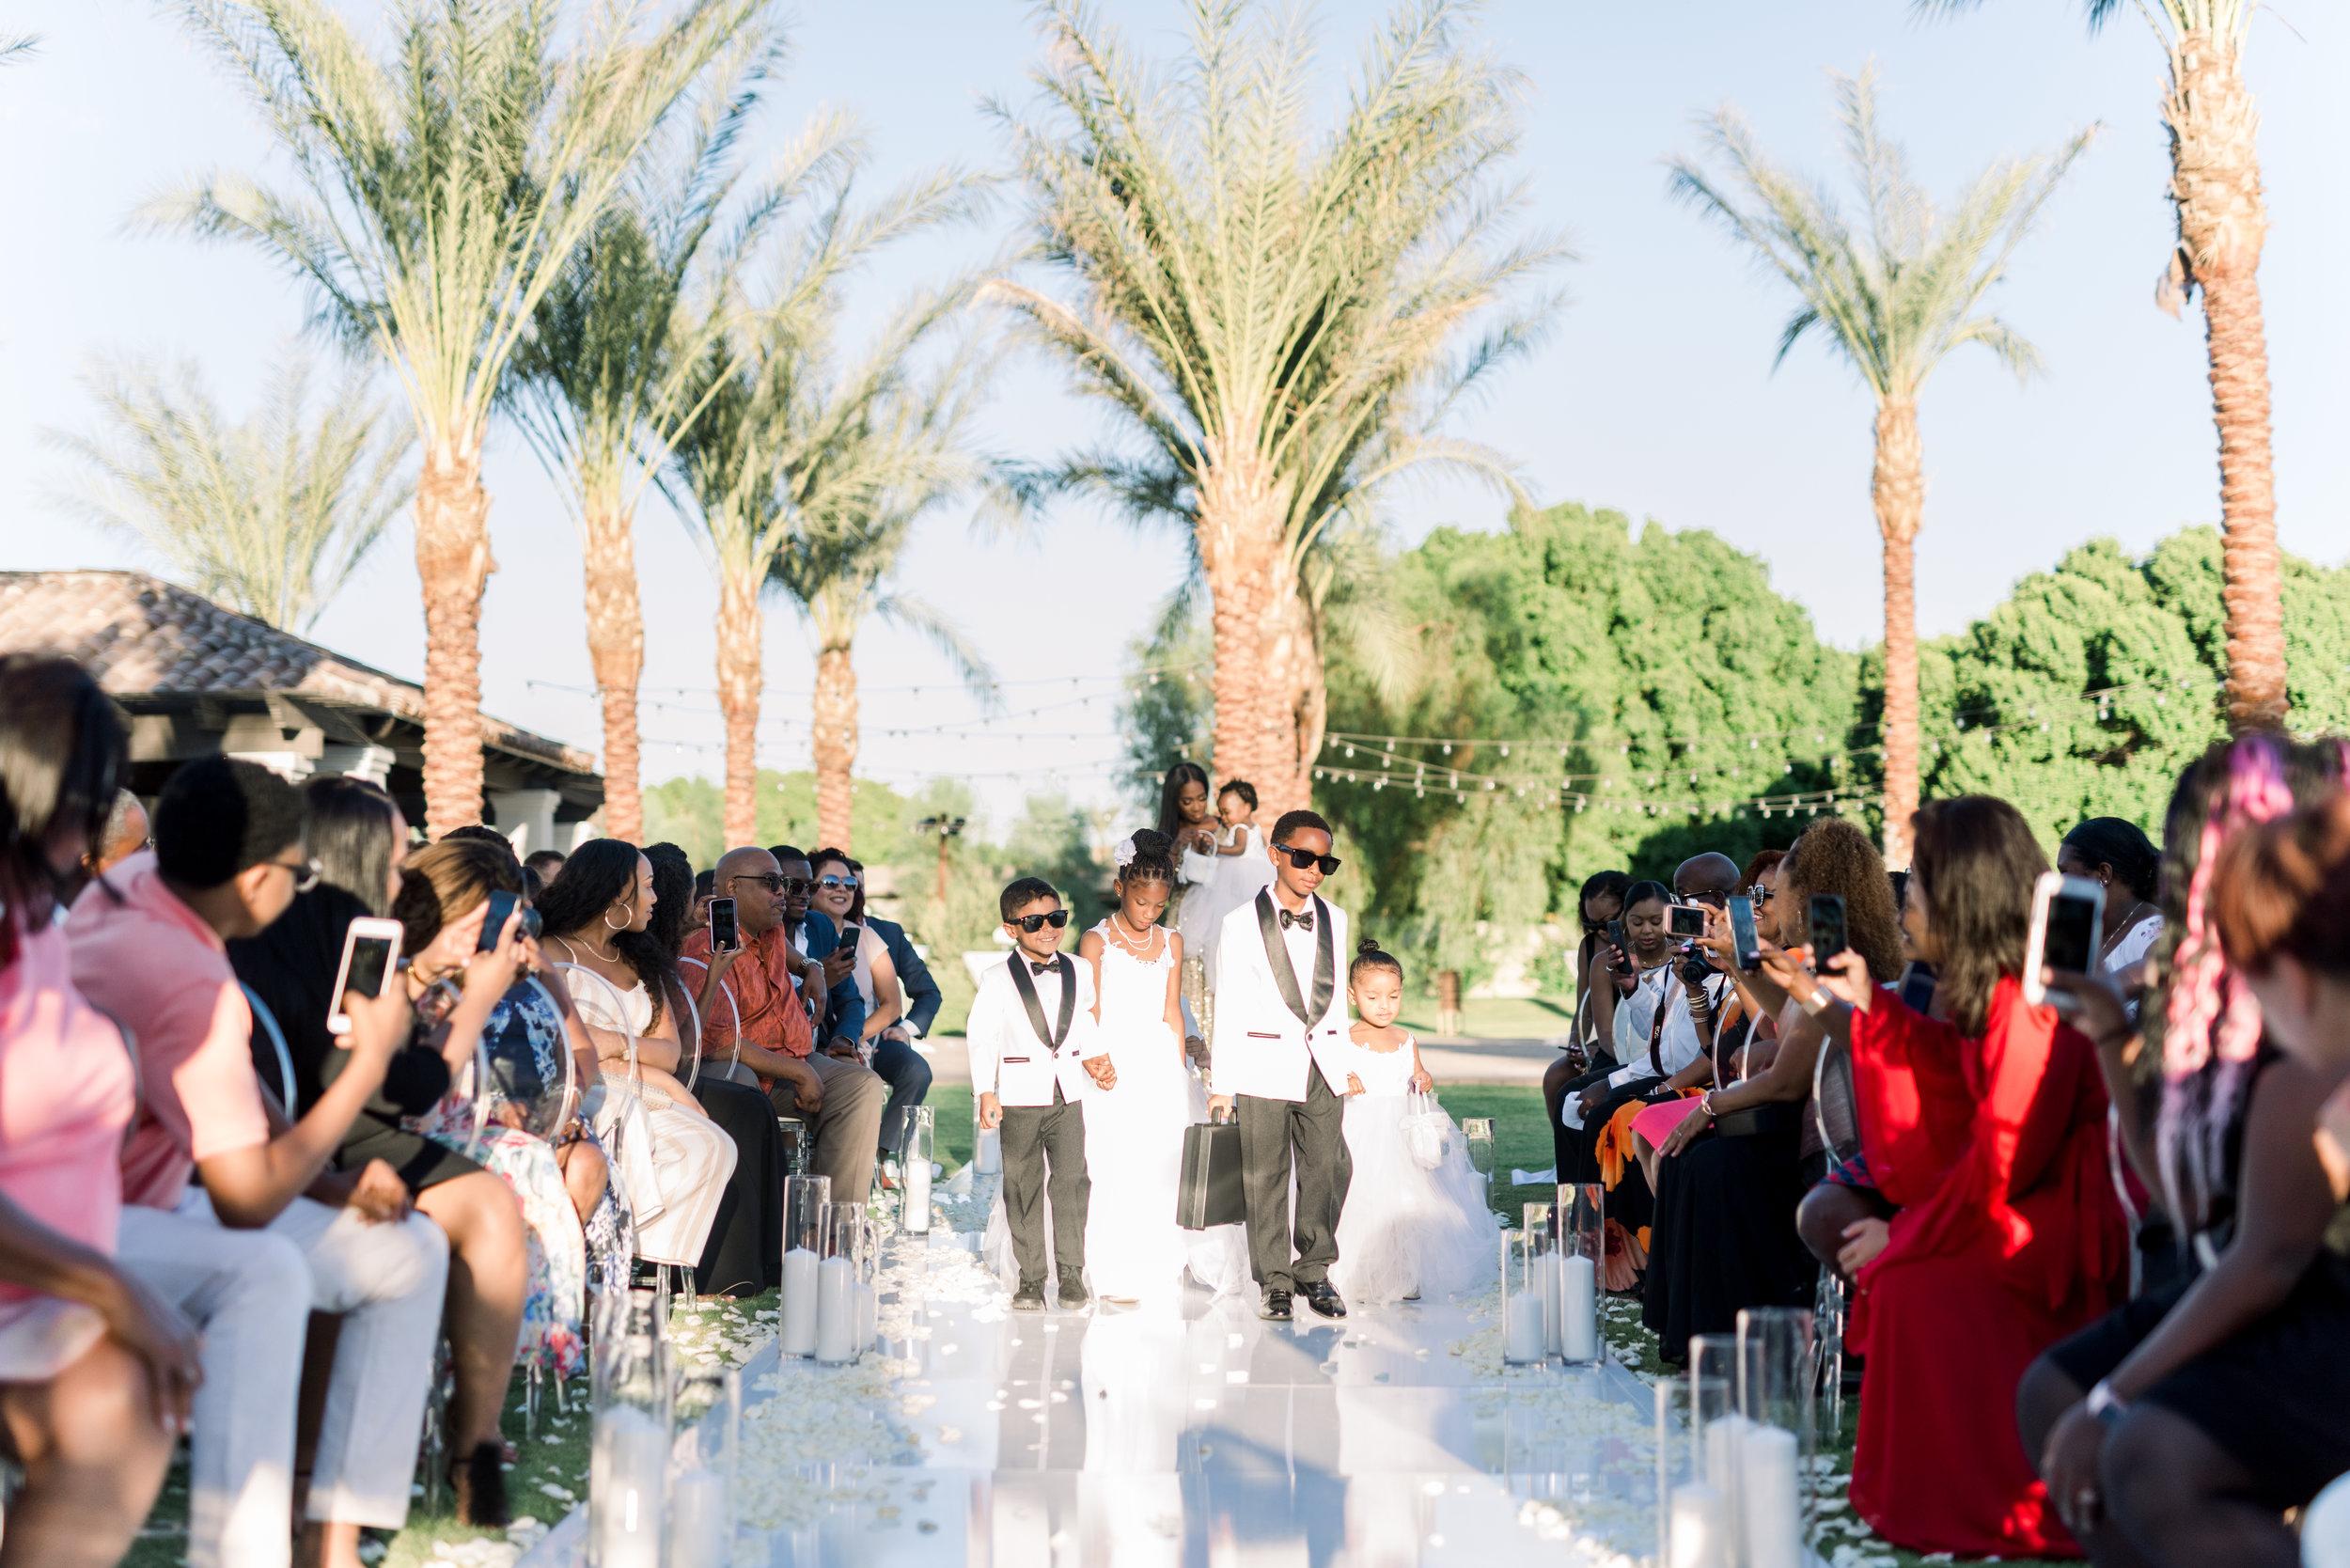 Ceremony-54.jpg